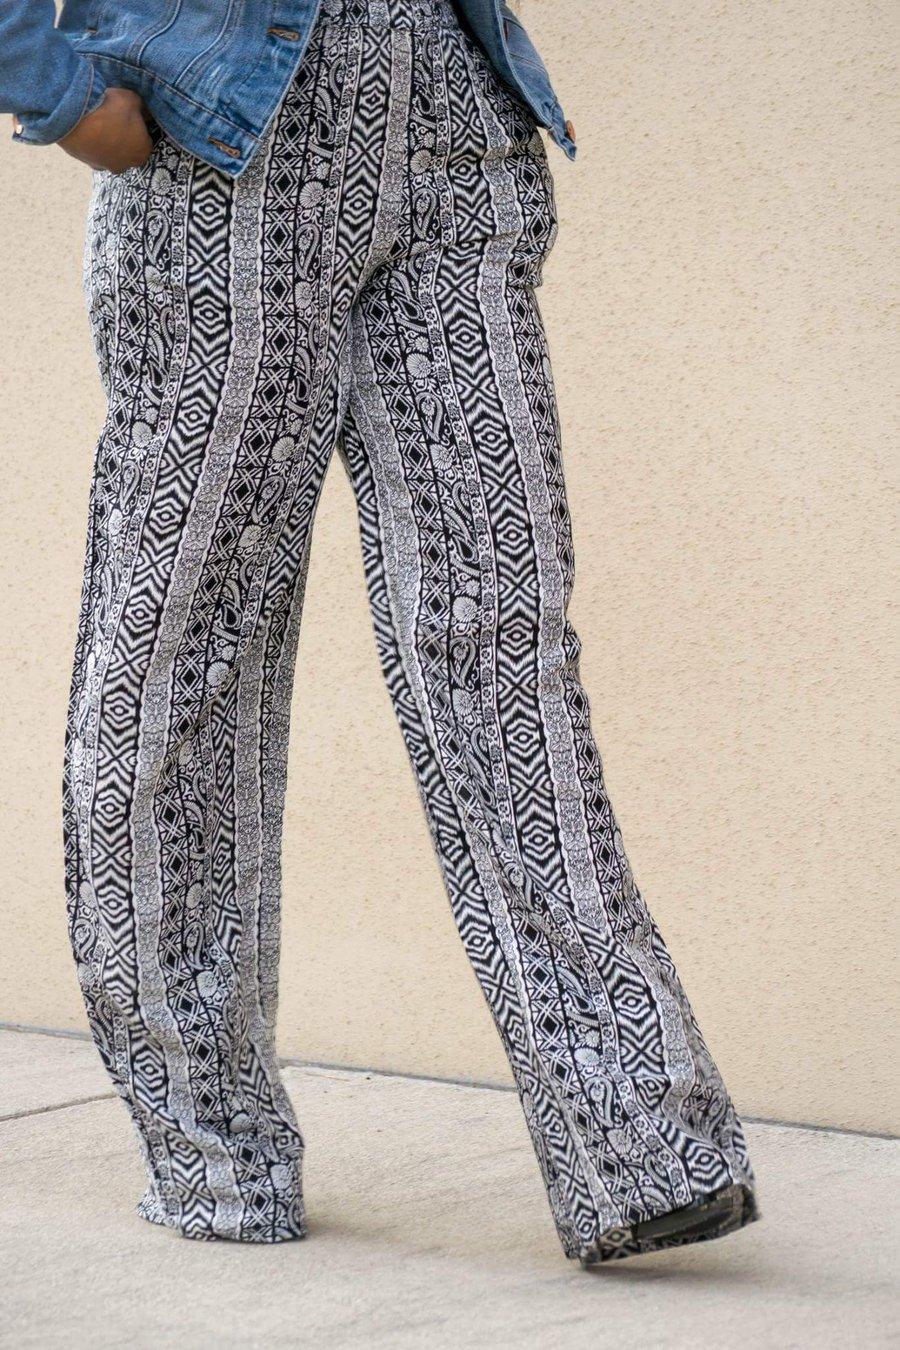 Image of Marley Pants